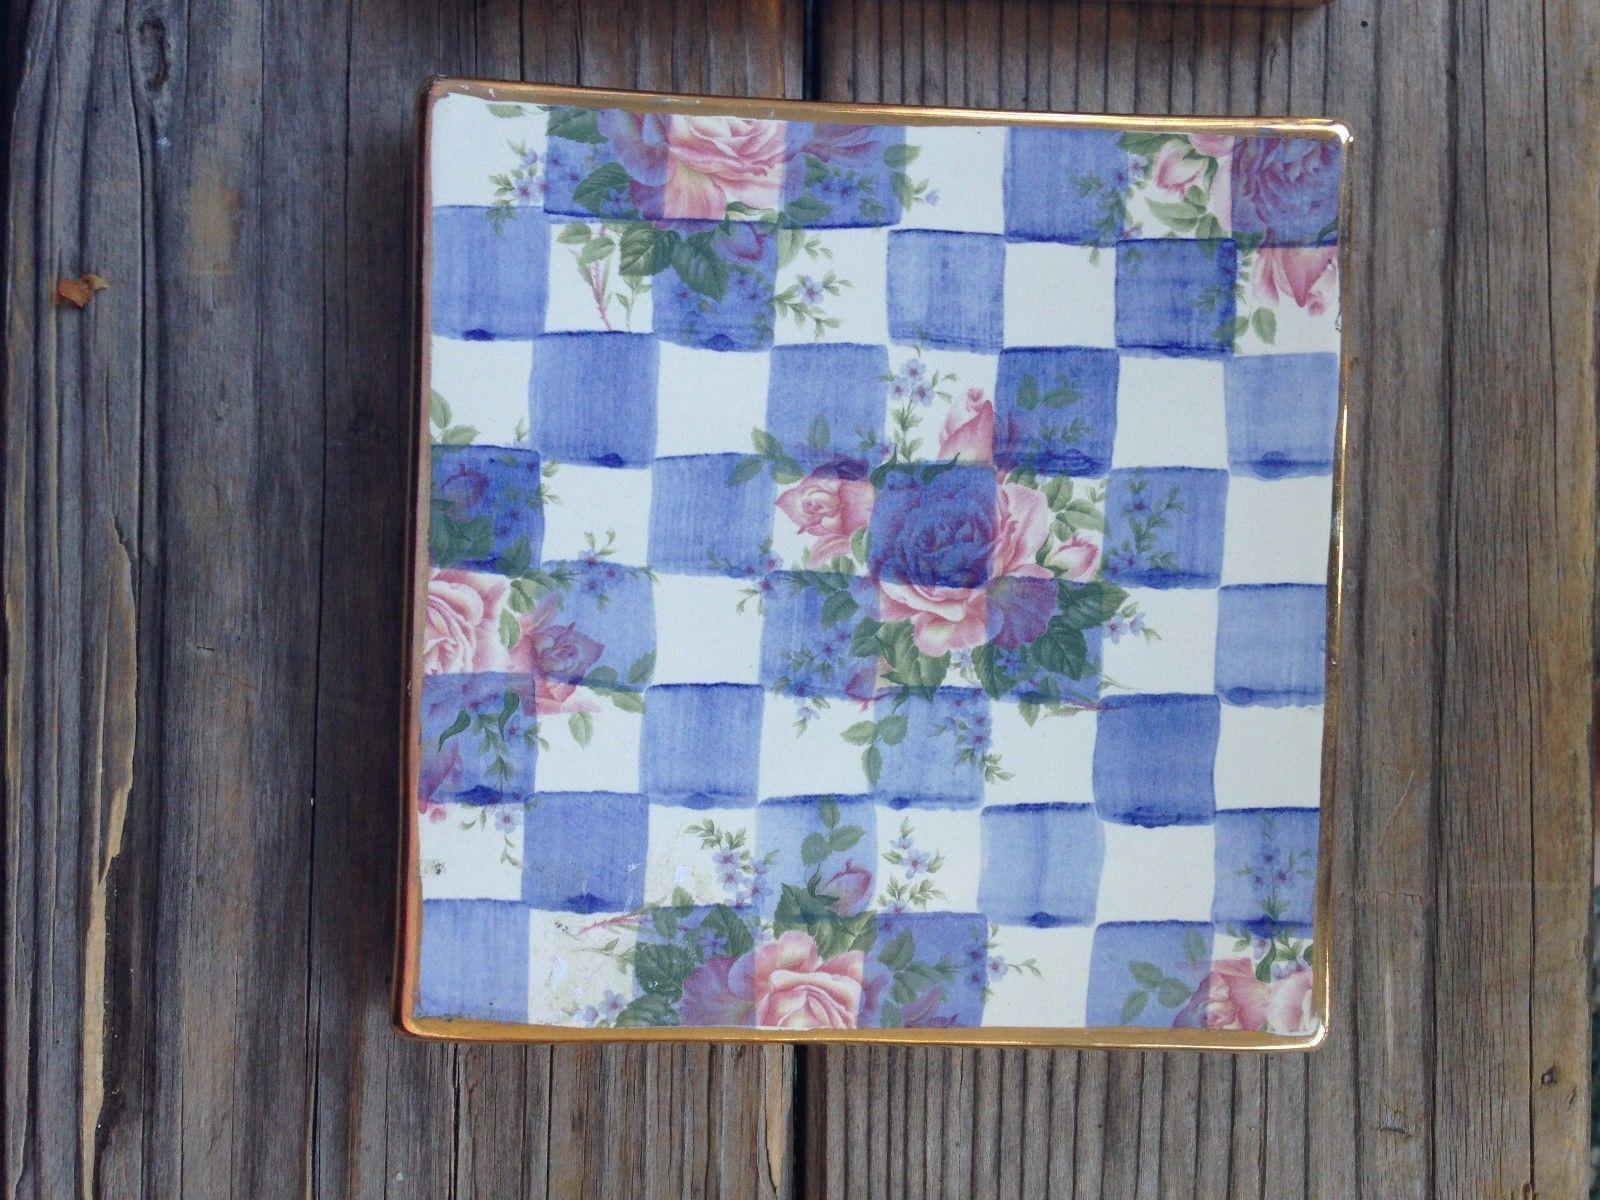 Mackenzie childs trivet ceramic blue and 50 similar items mackenzie childs trivet ceramic blue morning glory tile honeymoon 6 x 6 rare arubaitofo Image collections